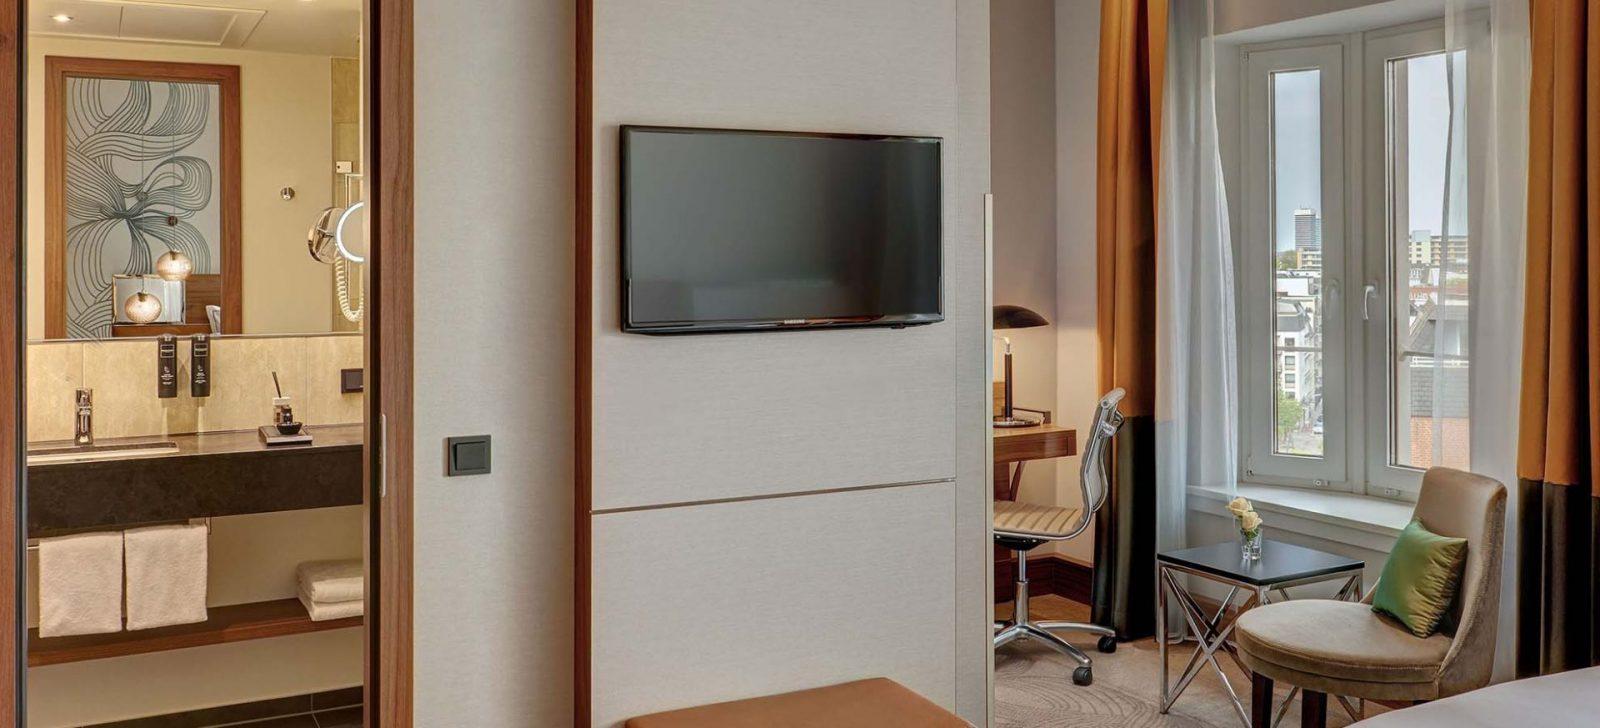 Reichshof Hotel Hamburg Medium Zimmer / Medium Room